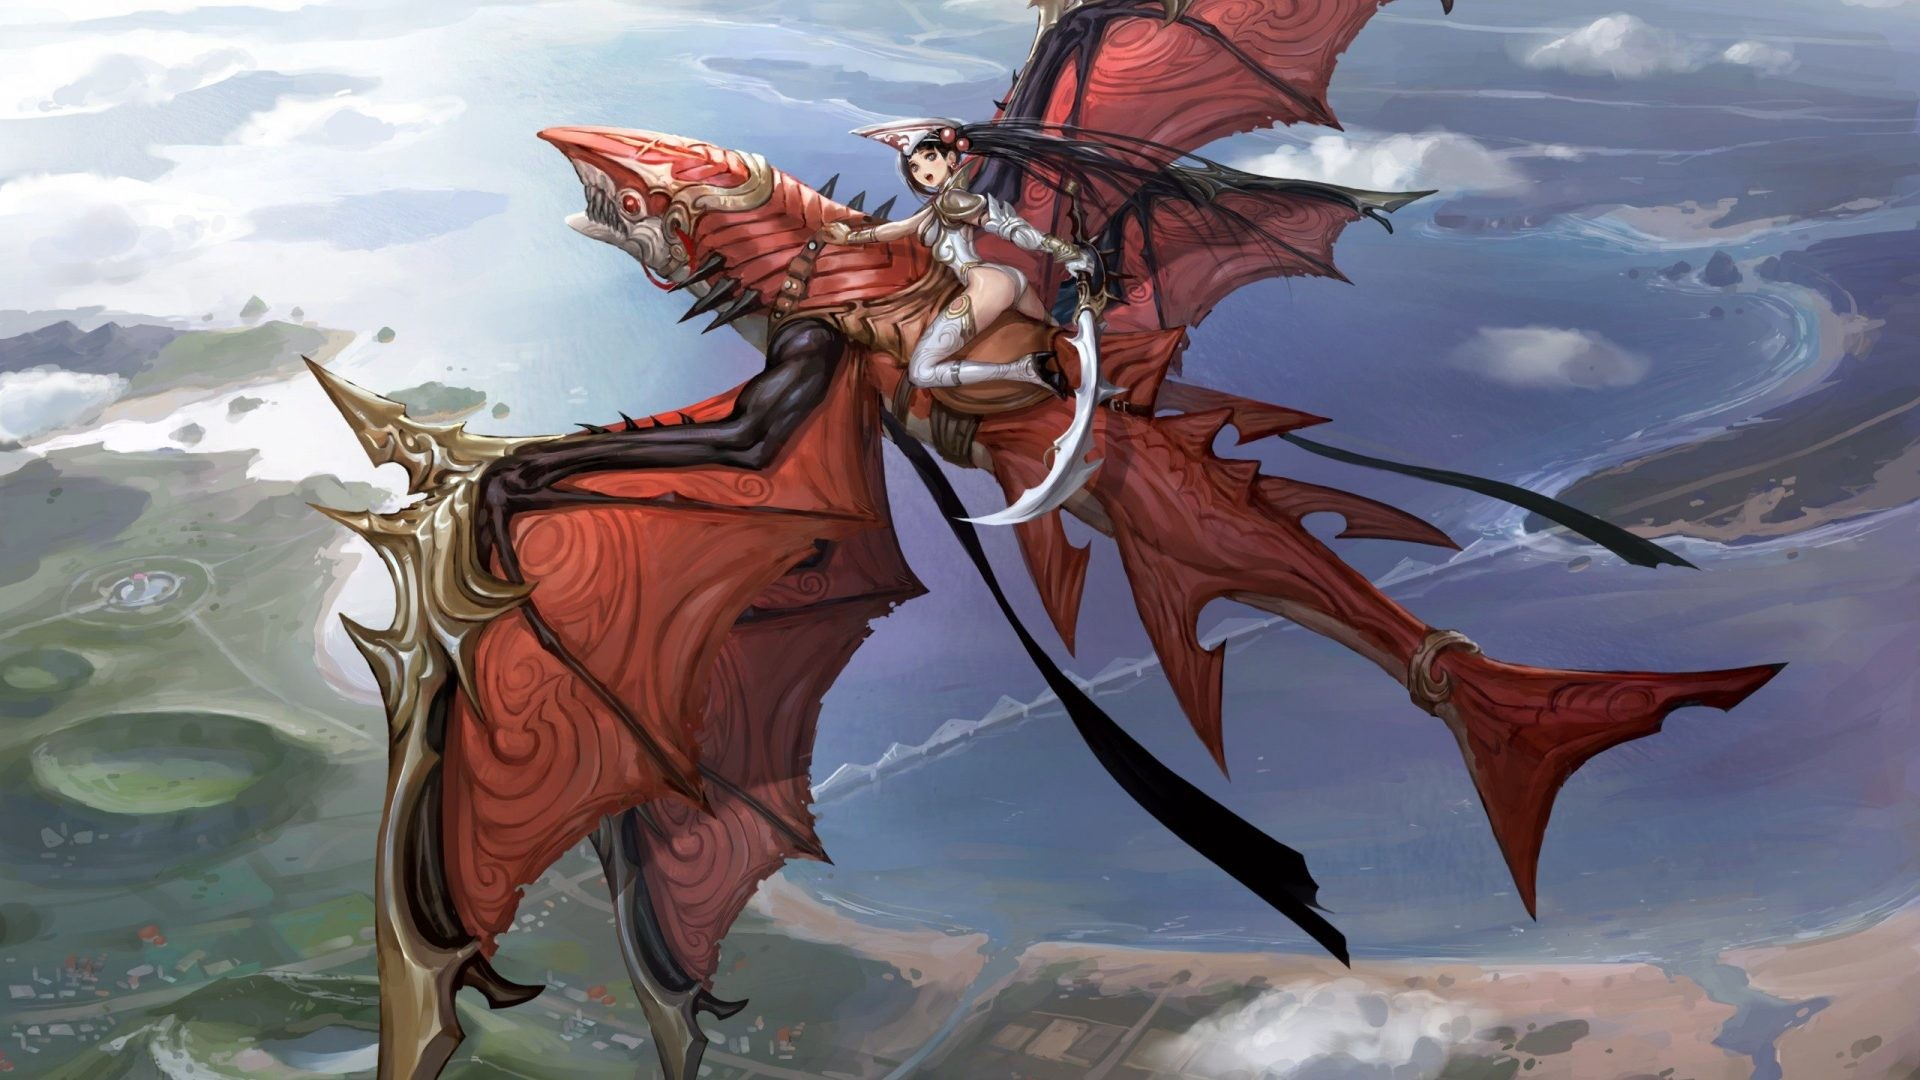 anime-dragon-flying-hd-wallpaper-[1920×1080] Need #iPhone